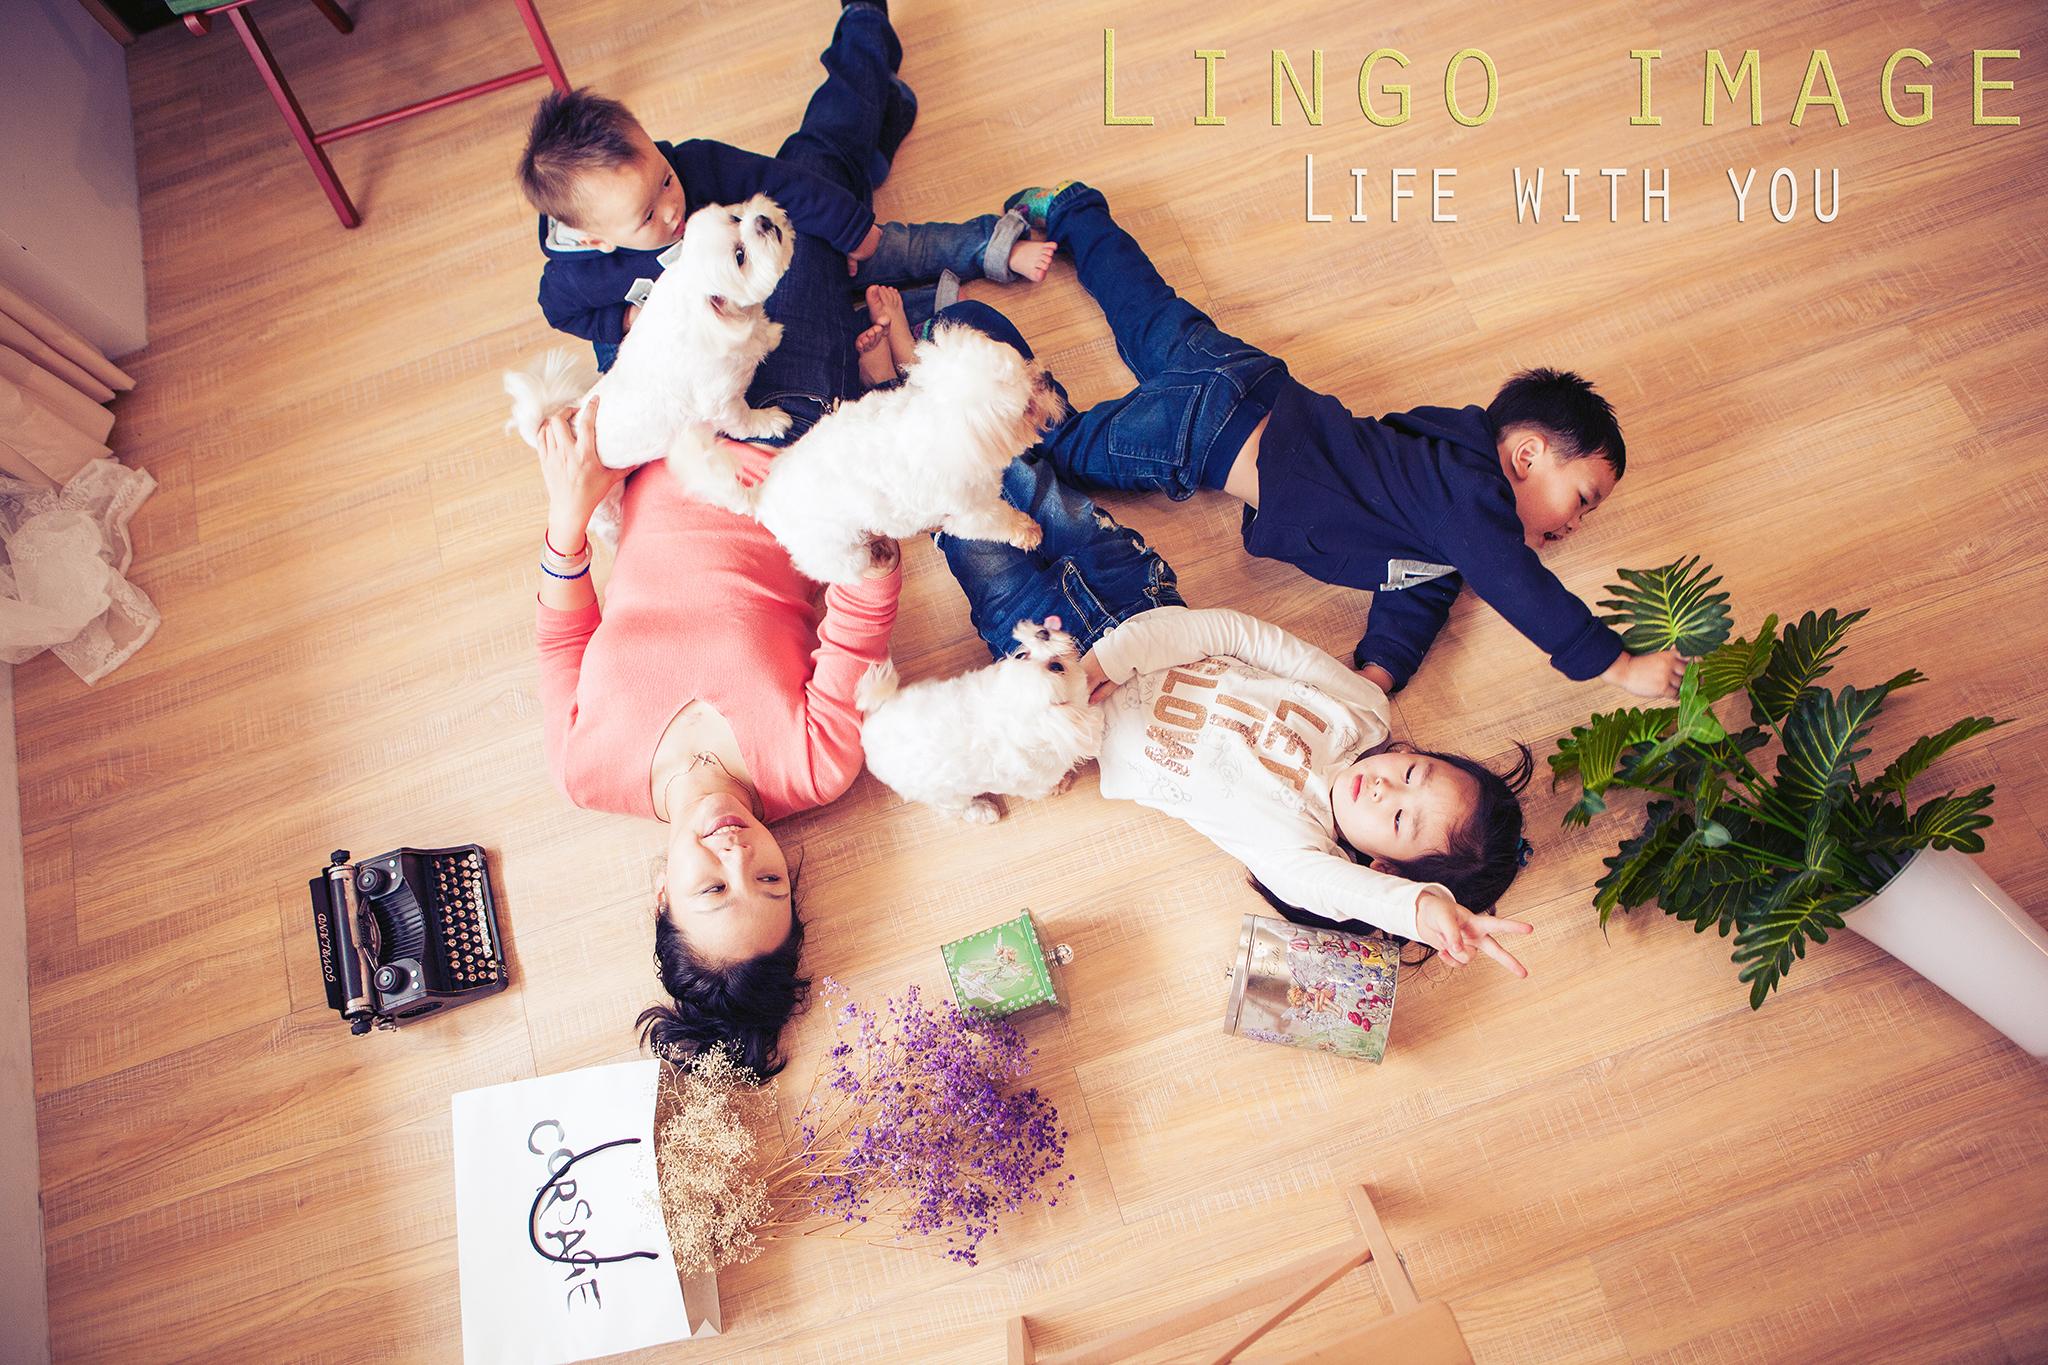 Lingo image_寵物39